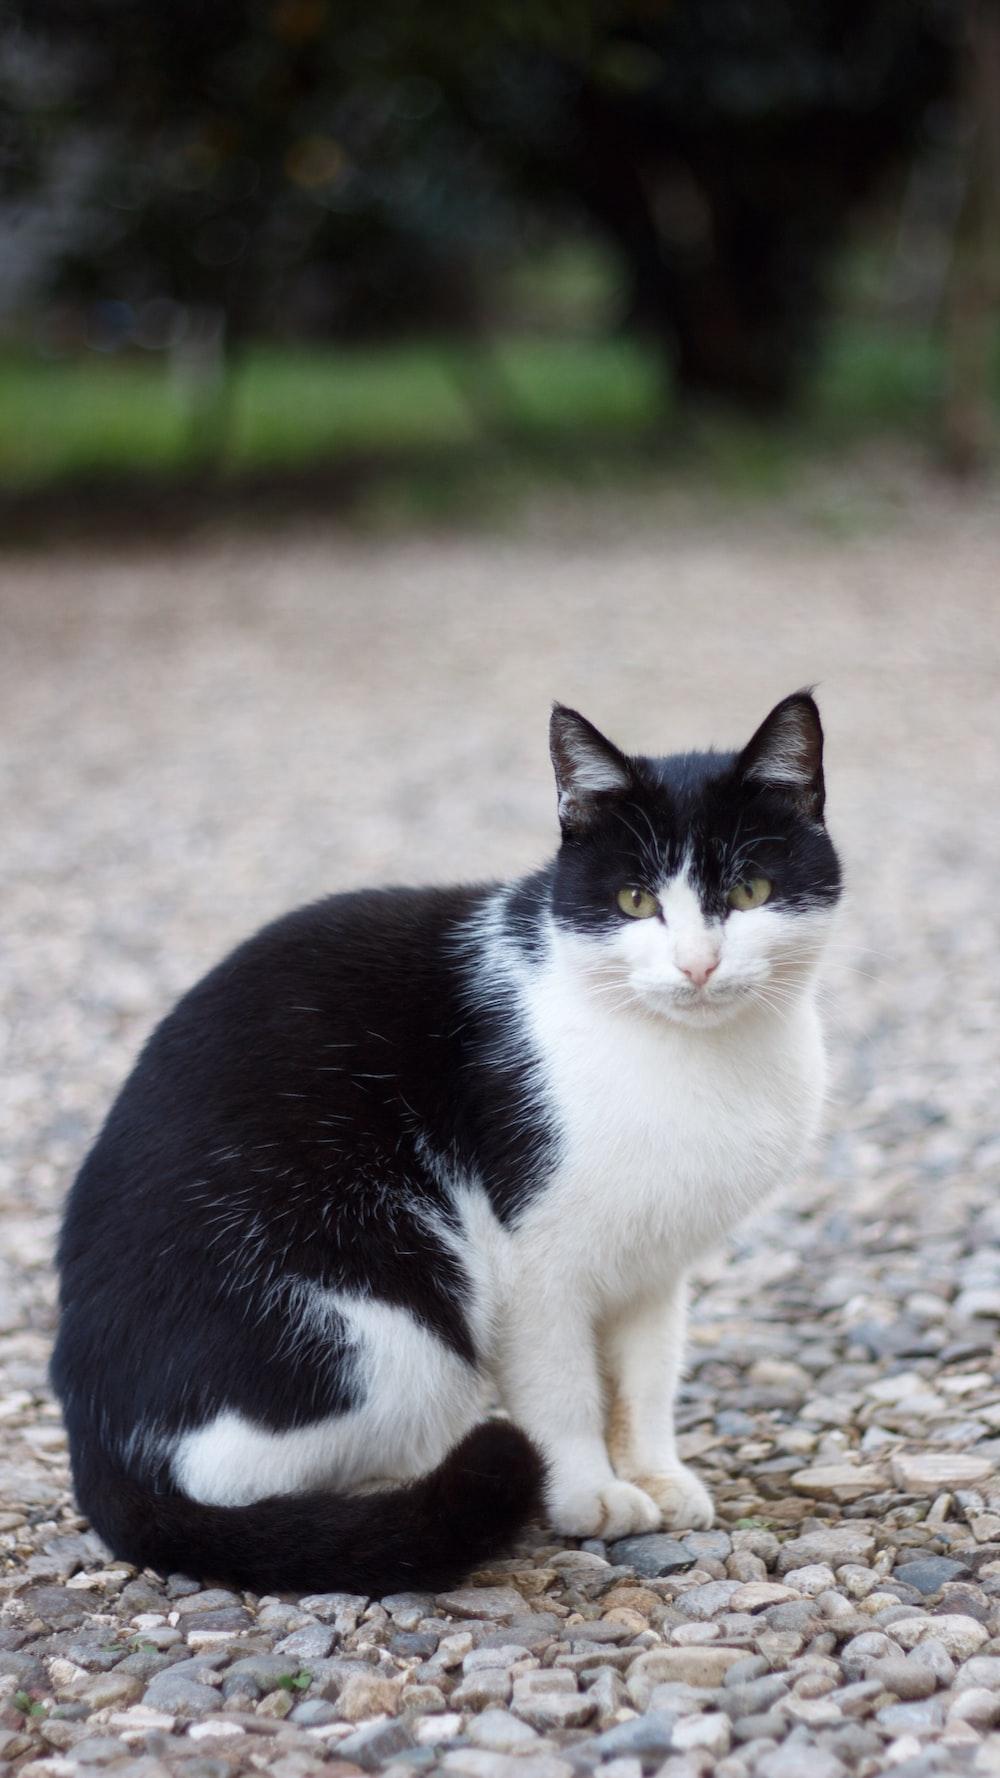 black and white cat on ground